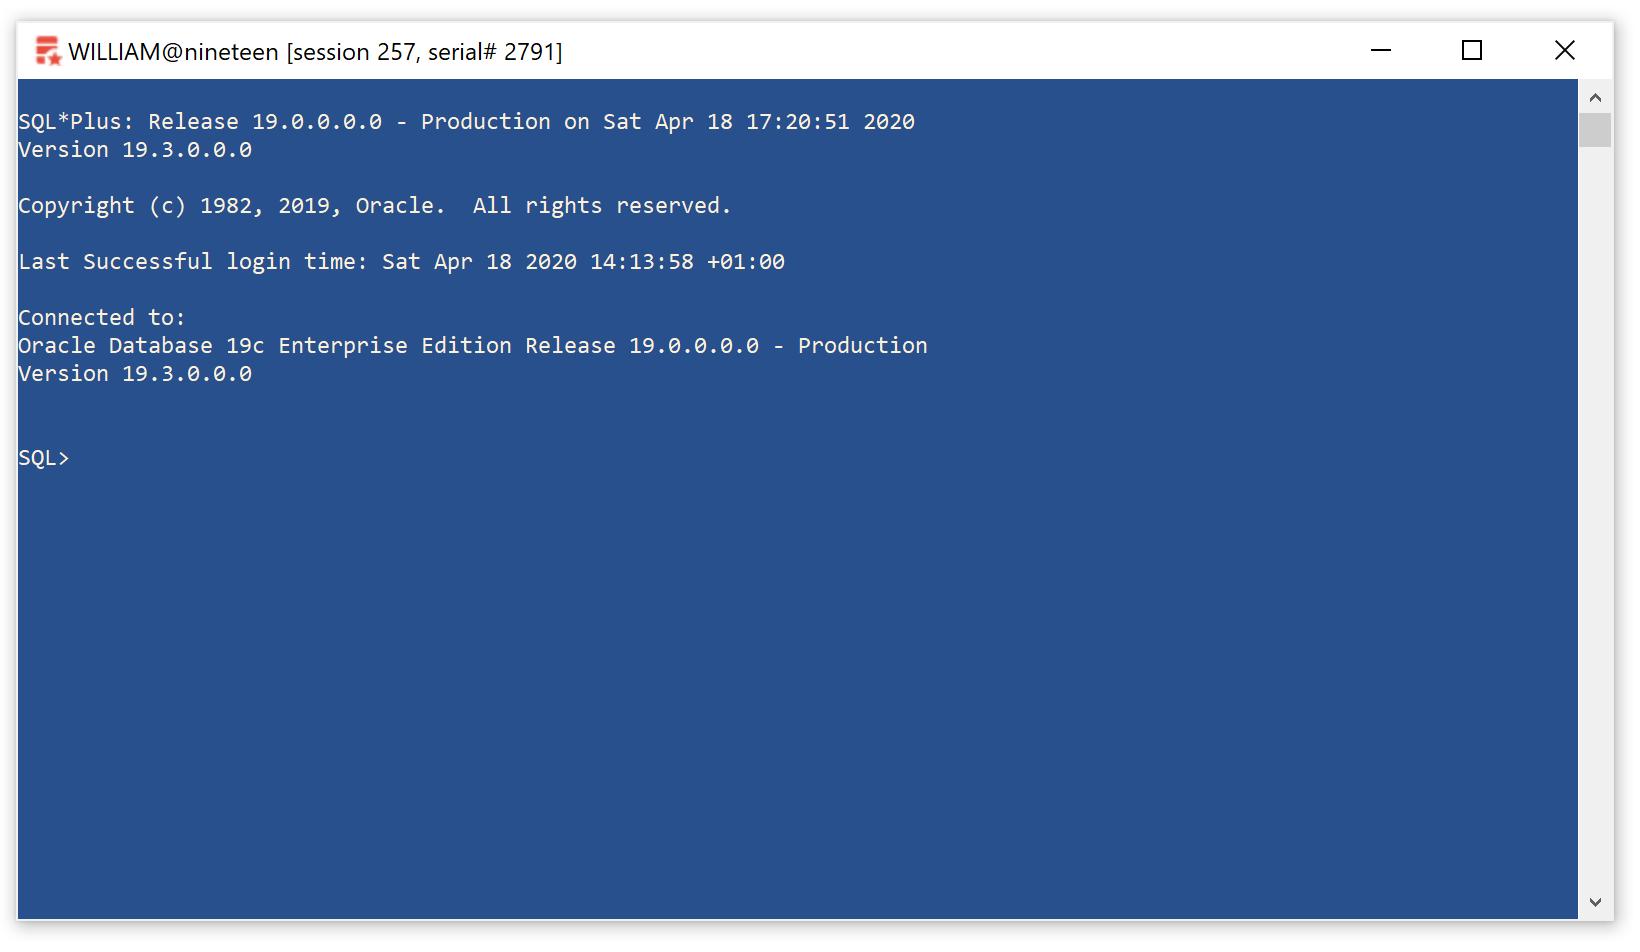 Setting up SQL*Plus on Windows